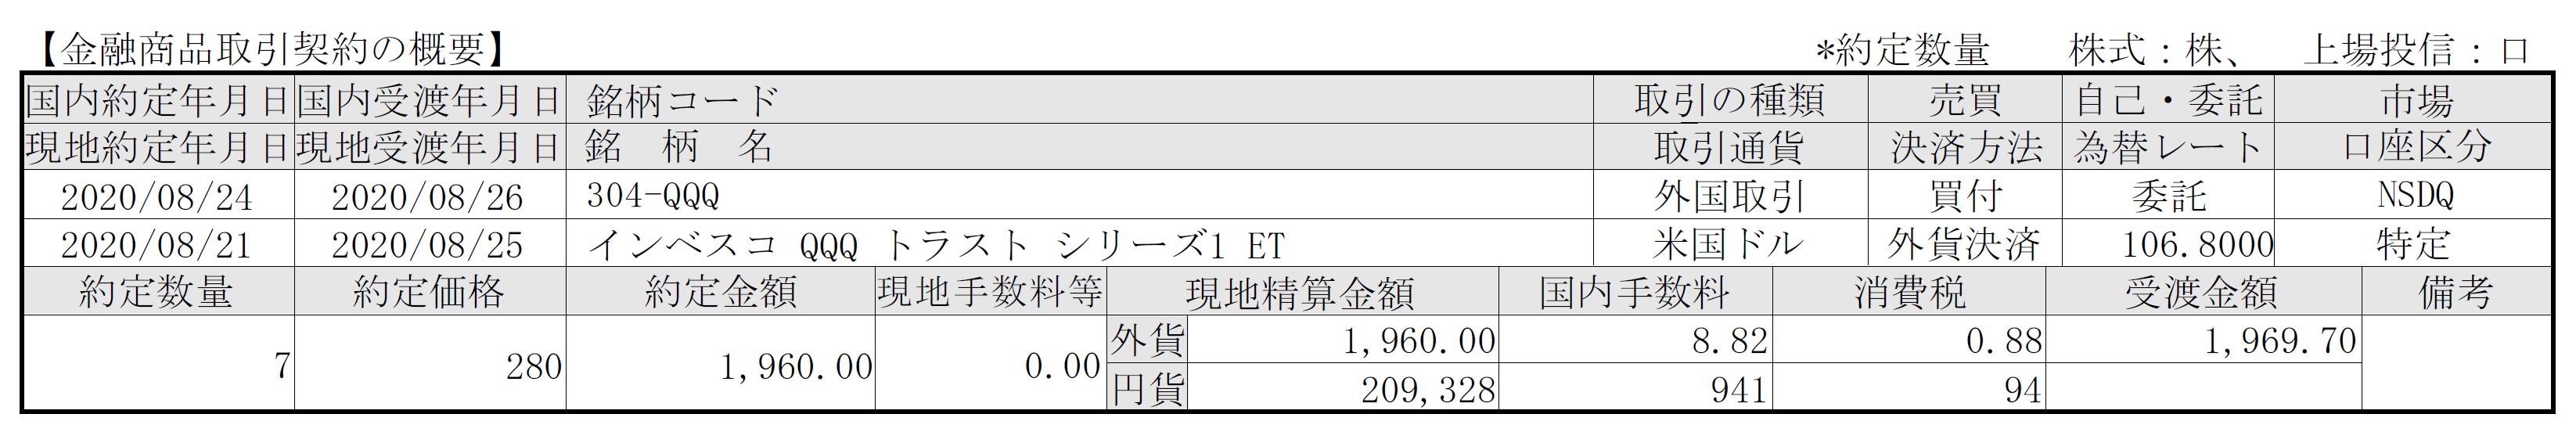 f:id:hodo-work:20200827155633p:plain